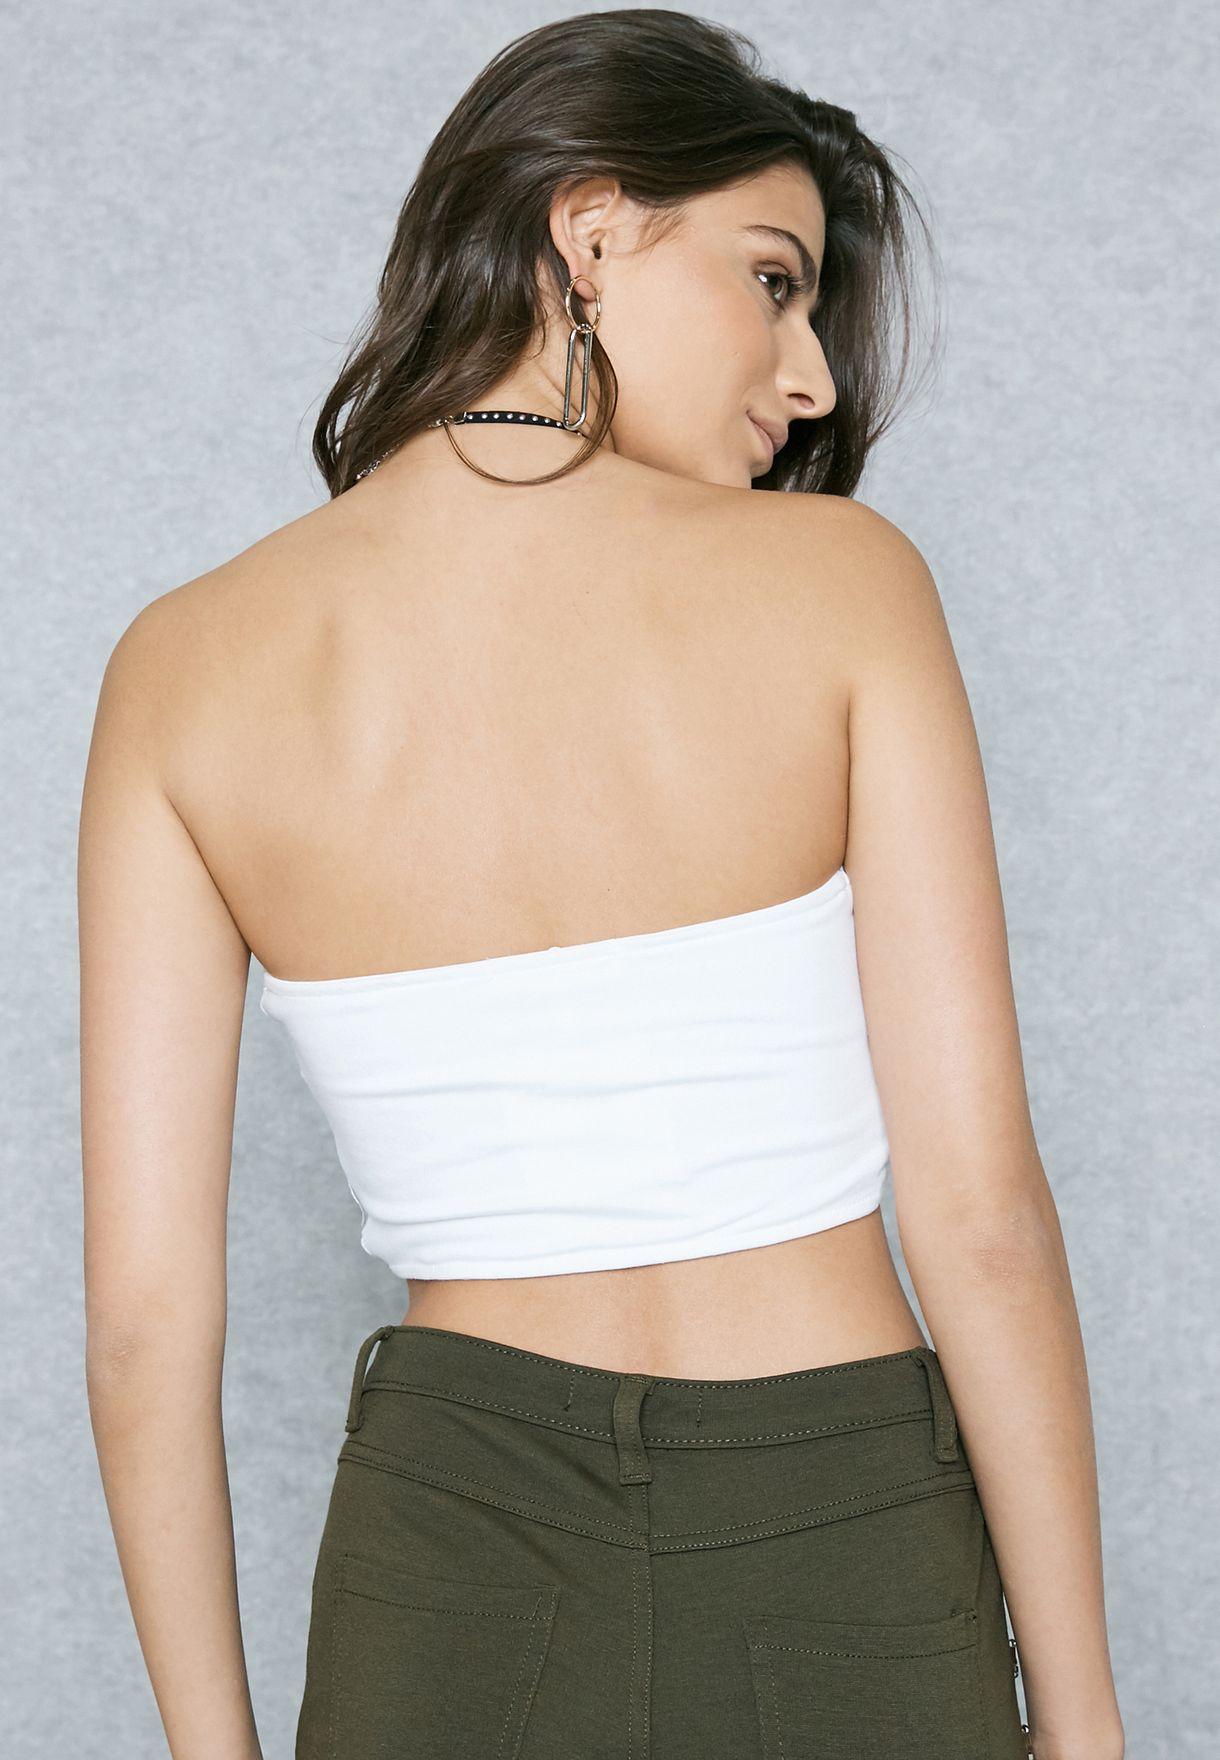 78f9ba9500731 Shop Missguided white Twist Front Bandeau Crop Top TJ412758 for ...